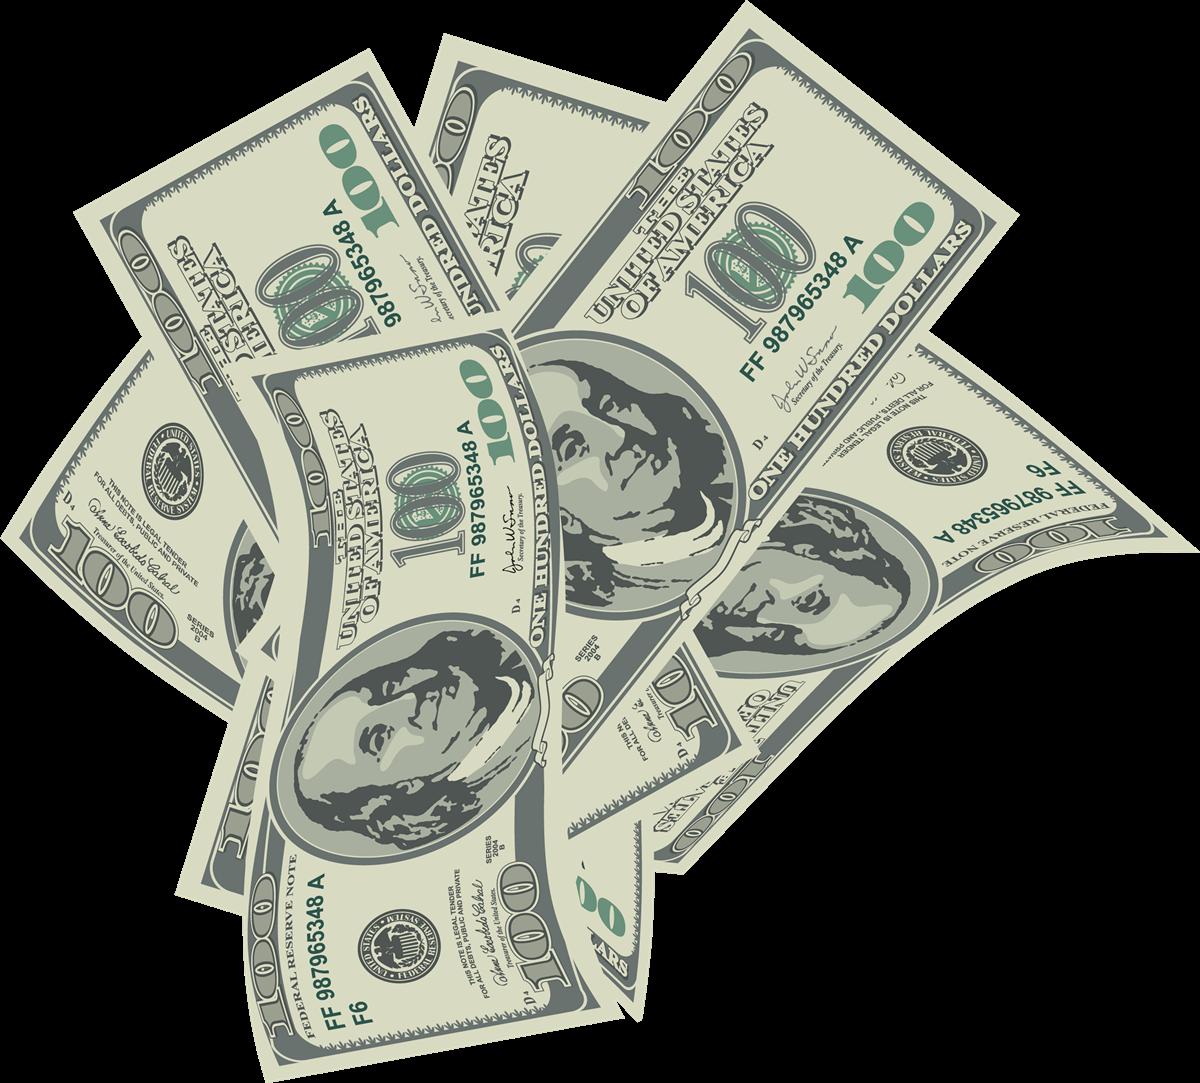 Money png image. Cash mart